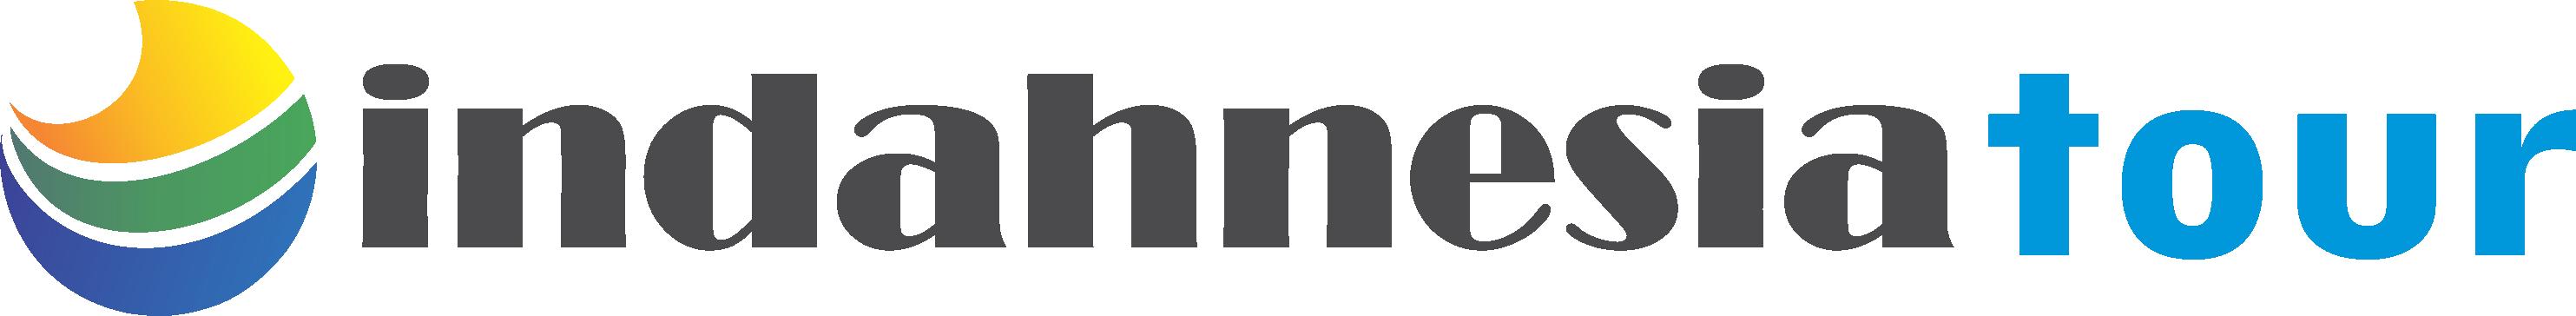 INDAHNESIA